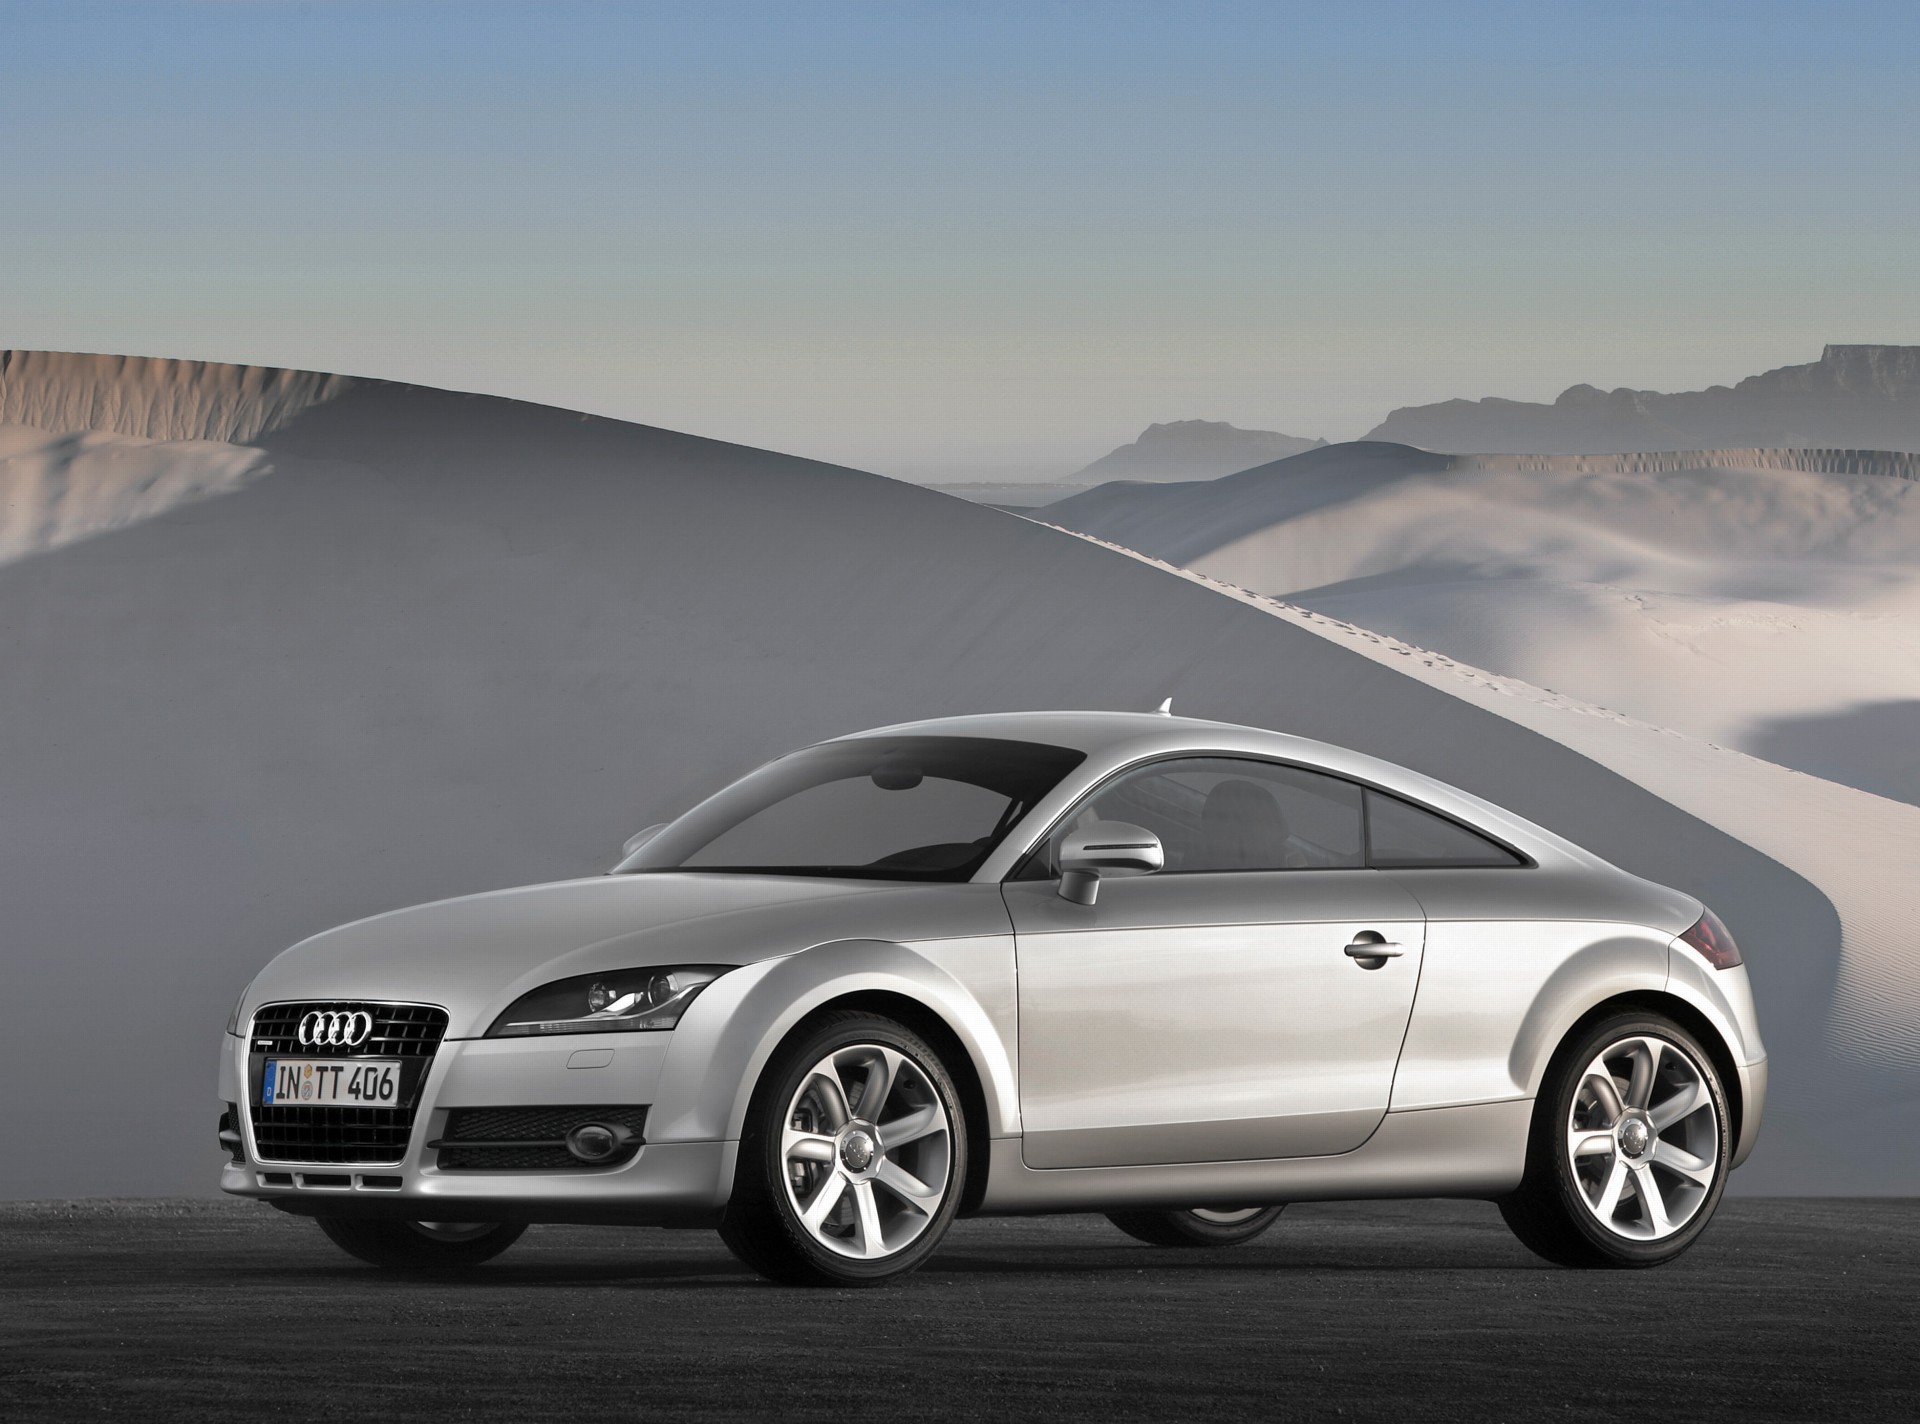 2007 Audi TT Concept Image